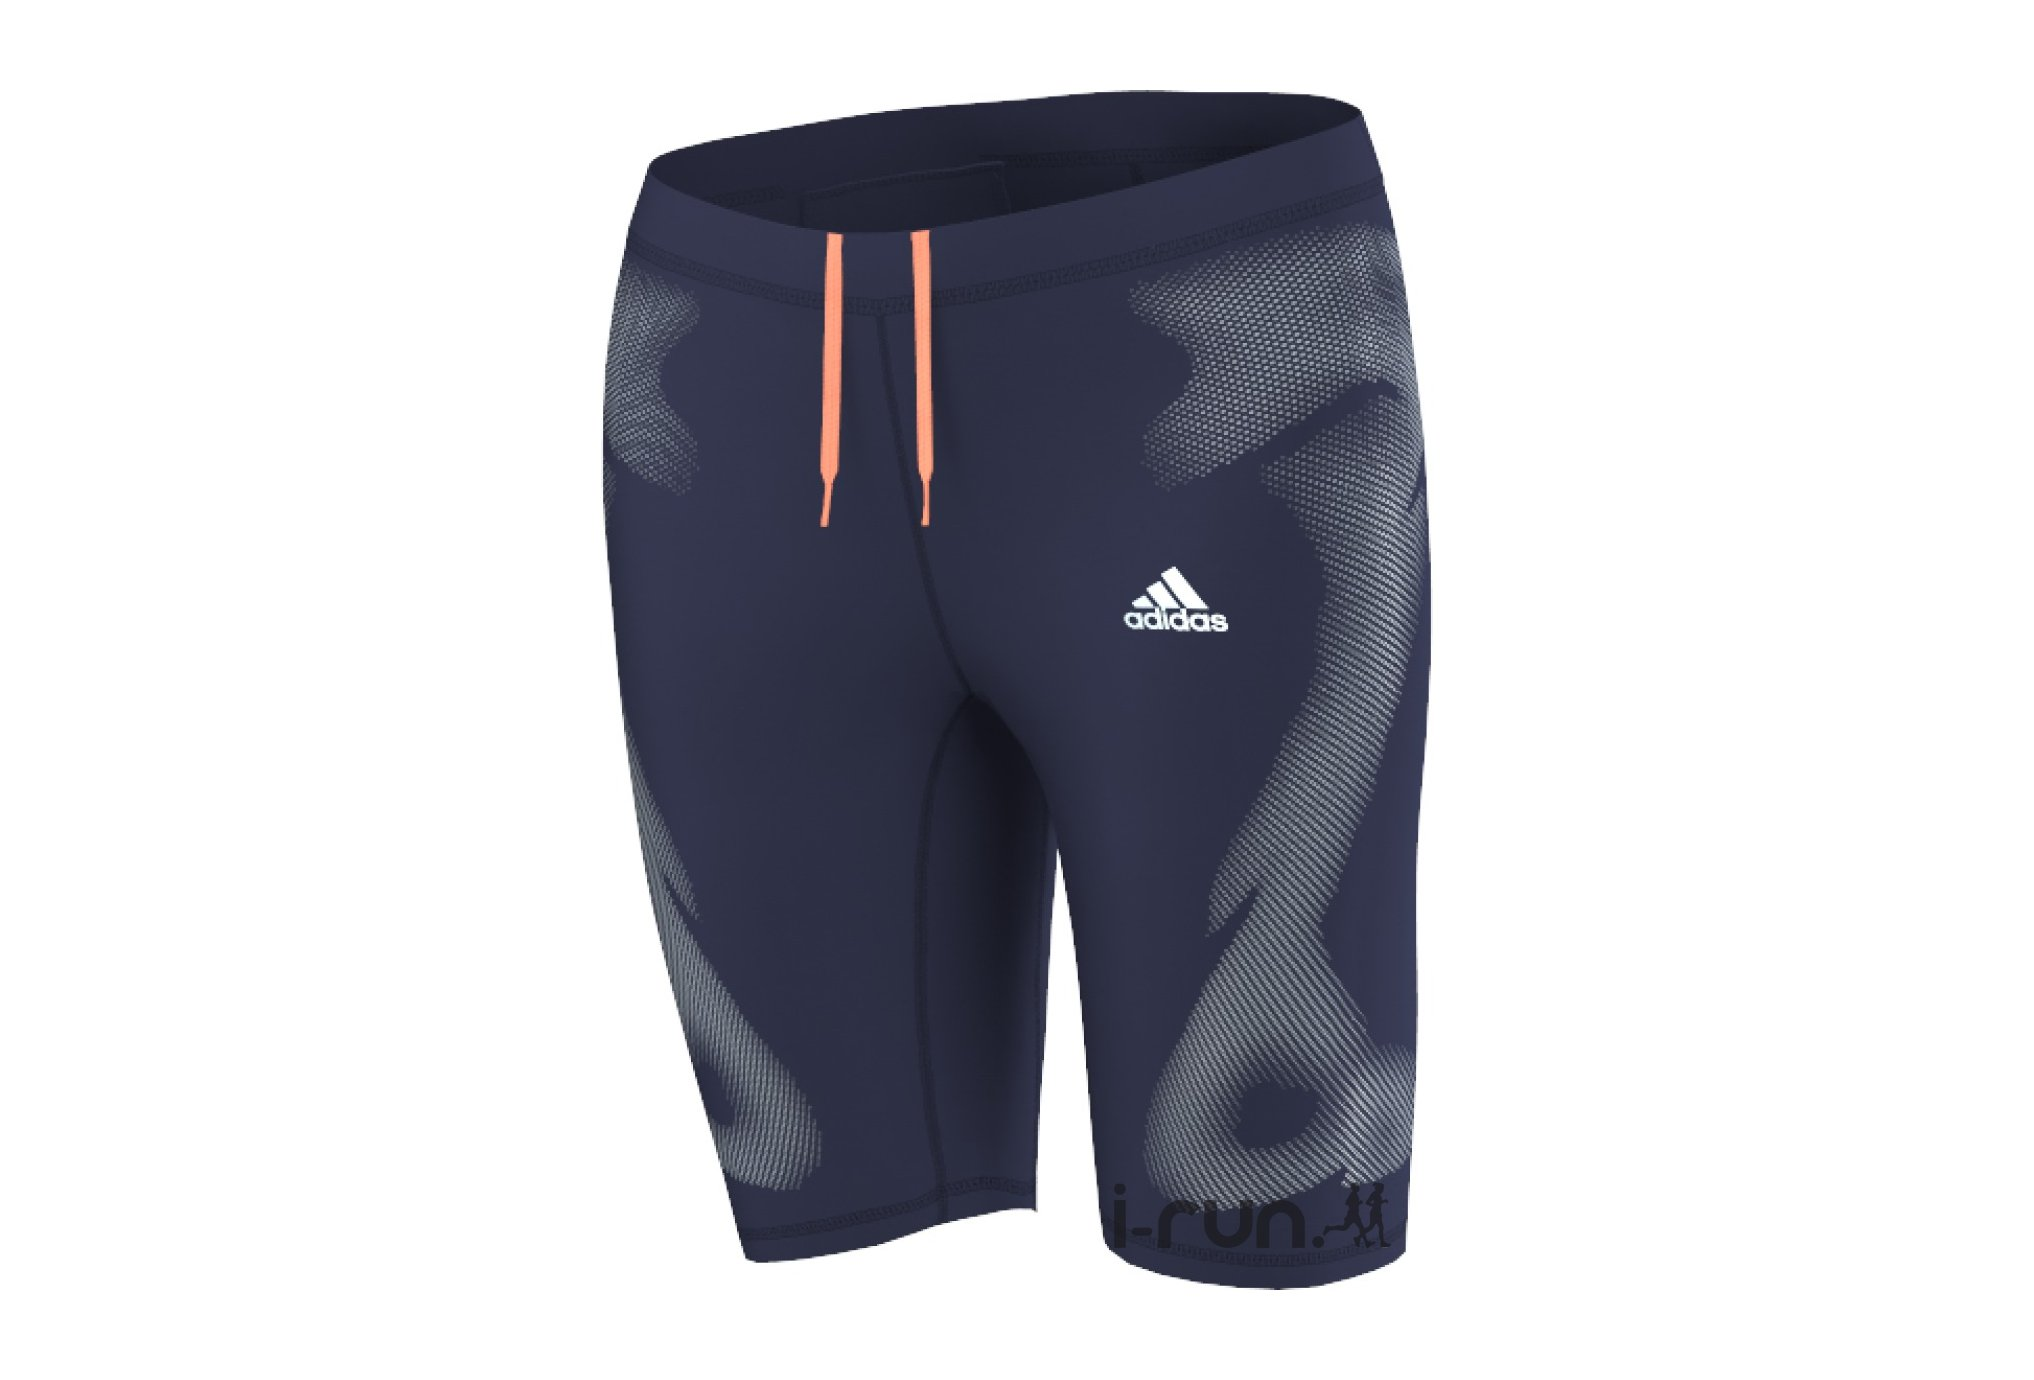 Adidas Cuissard adizero sprintweb w vêtement running femme